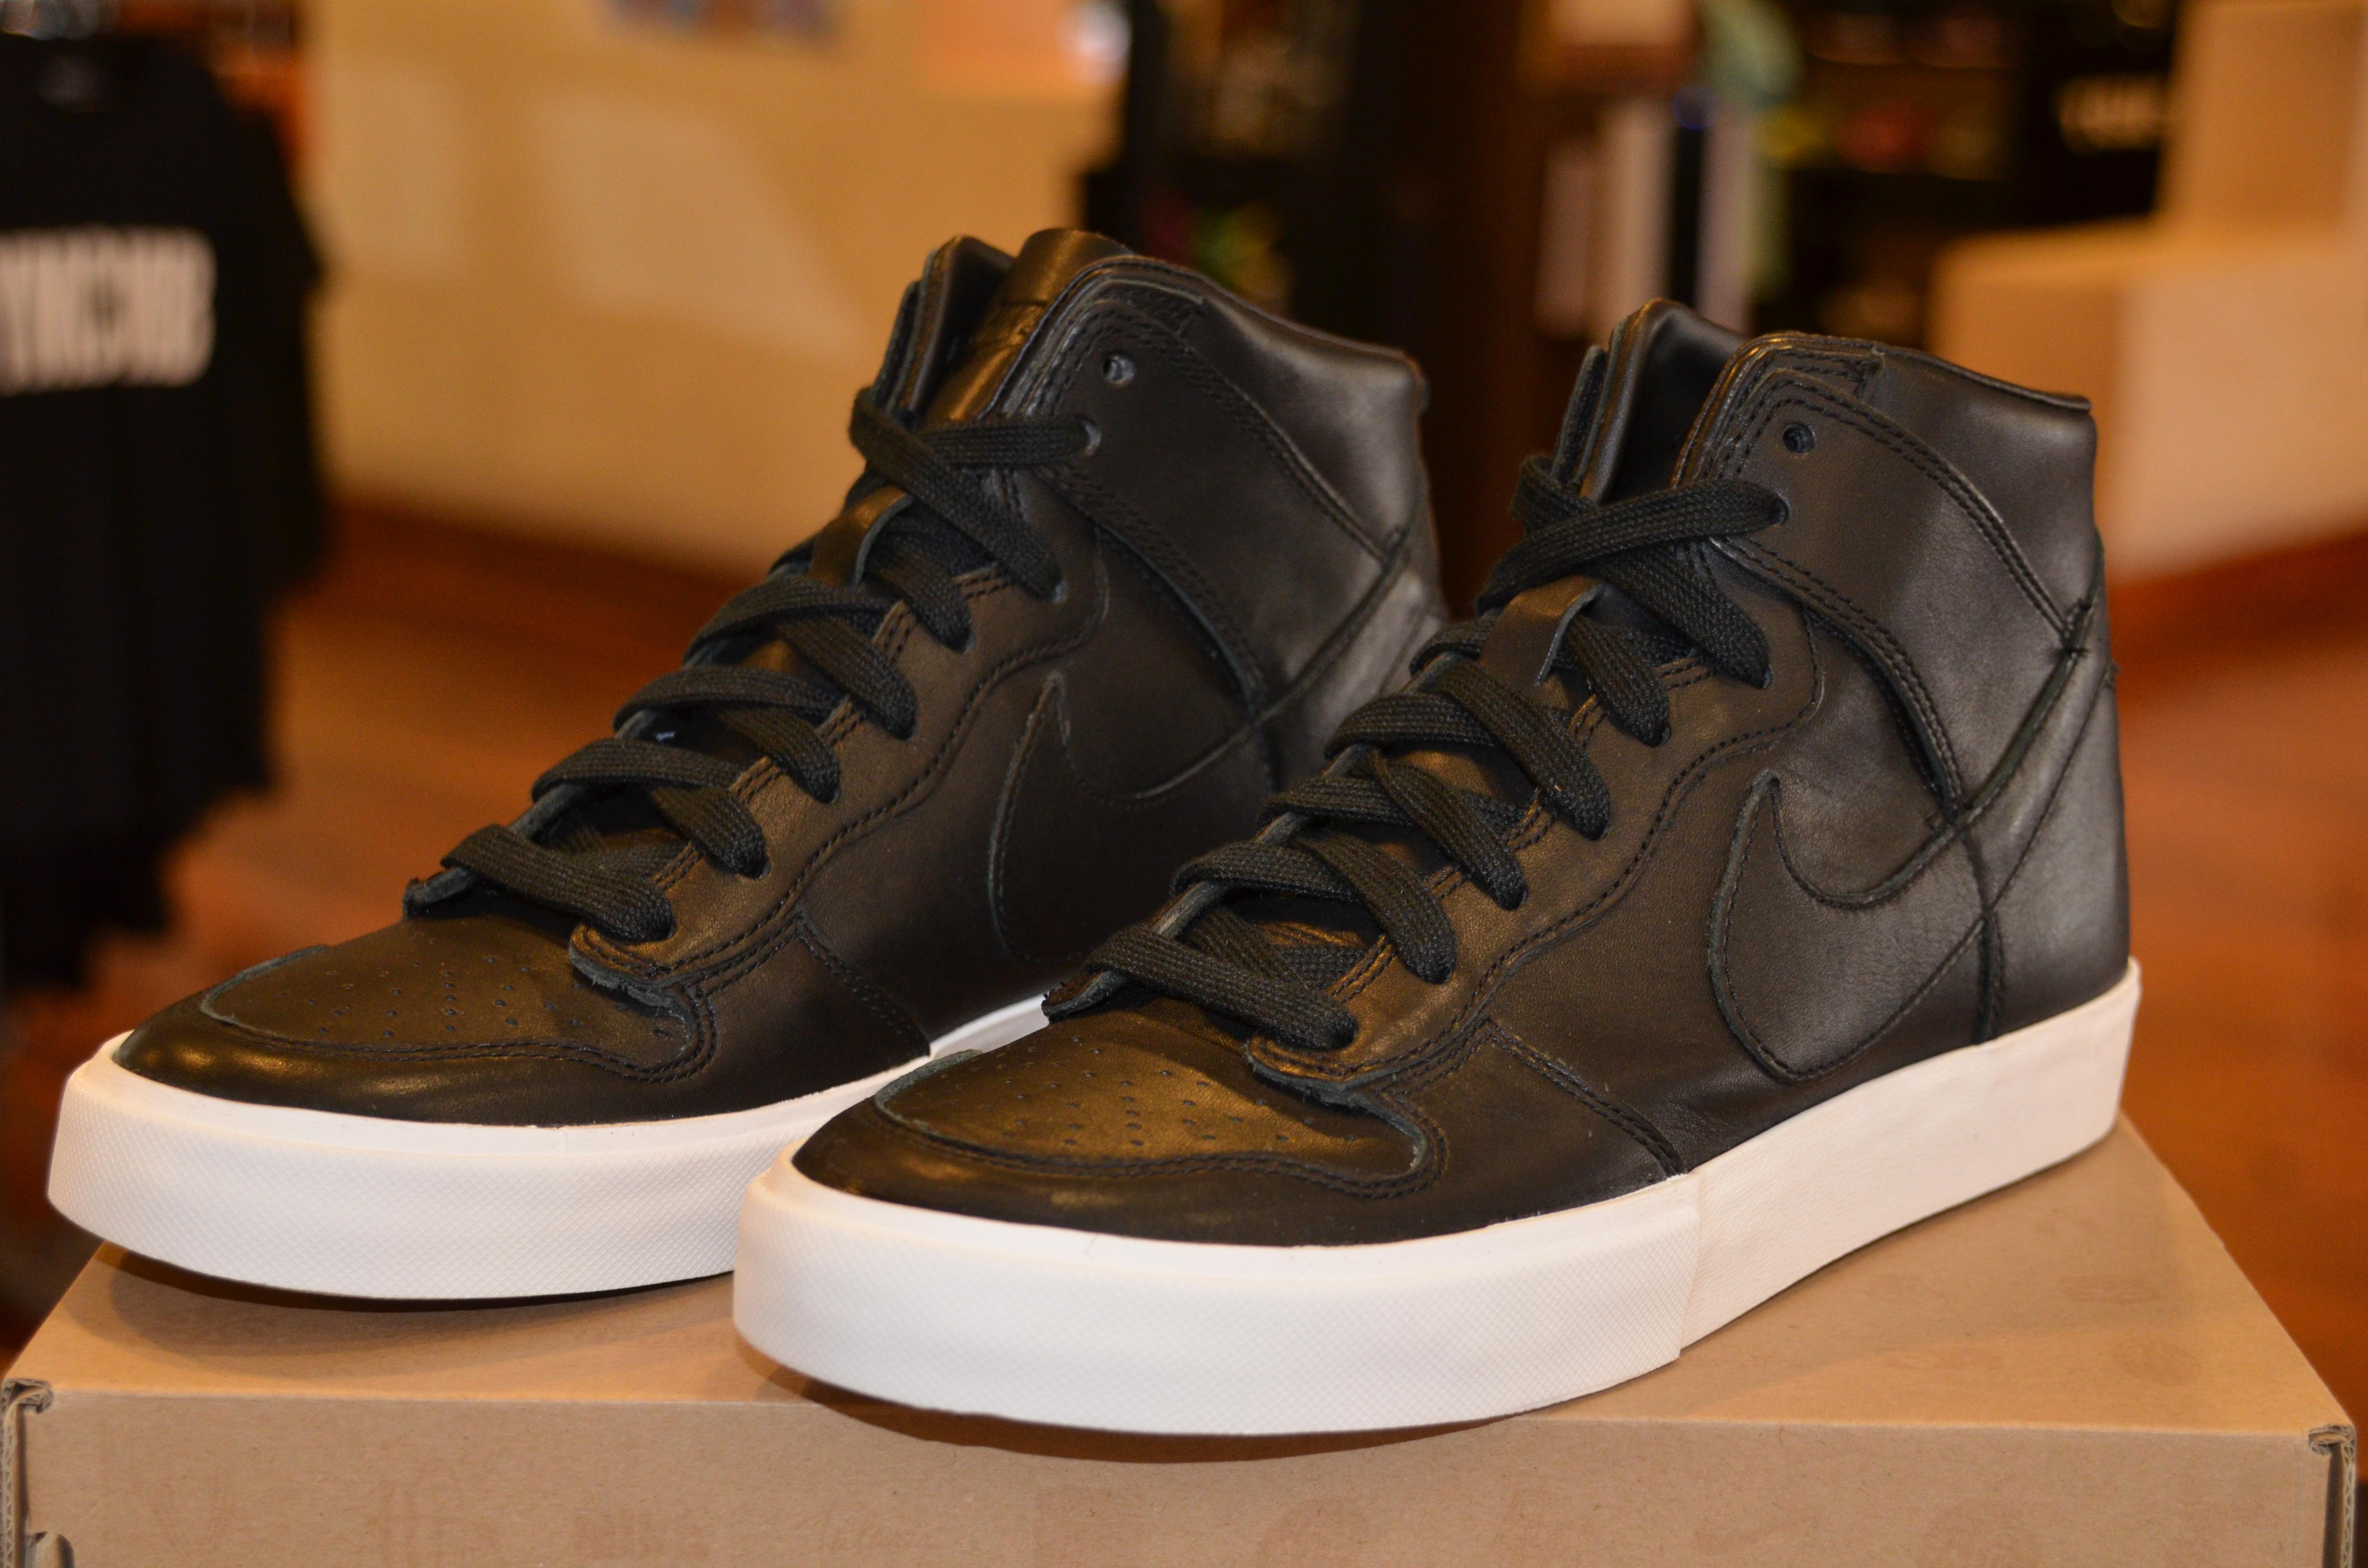 8b82a9f5a189 Nike Dunk Hi AC QS 398263-701